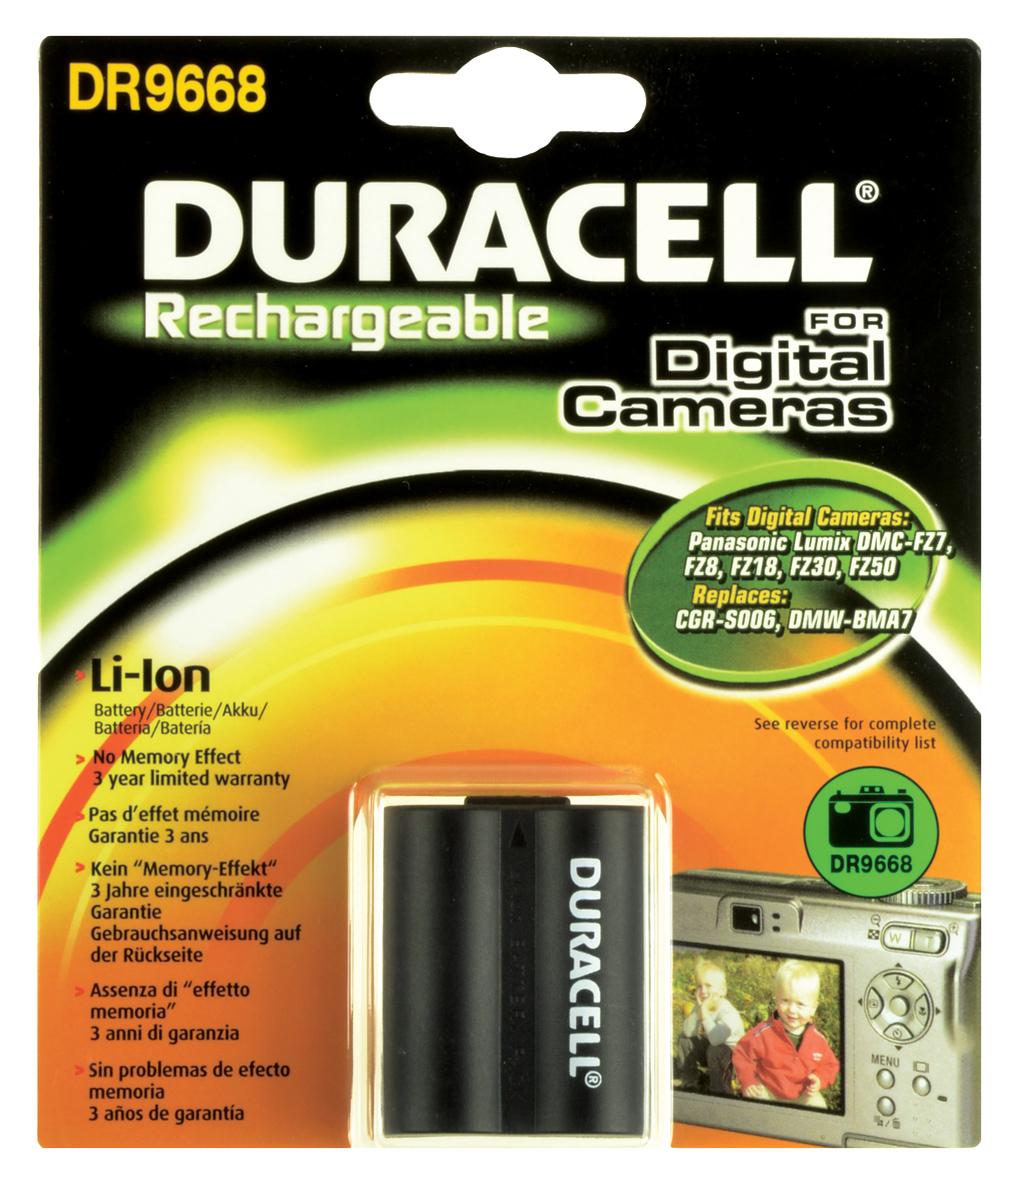 Baterie do fotoaparátu Panasonic Lumix DMC-FZ8EB-K/Lumix DMC-FZ8EB-S/Lumix DMC-FZ8EF-S/Lumix DMC-FZ8EG/Lumix DMC-FZ8GK/Lumix DMC-FZ8K/Lumix…